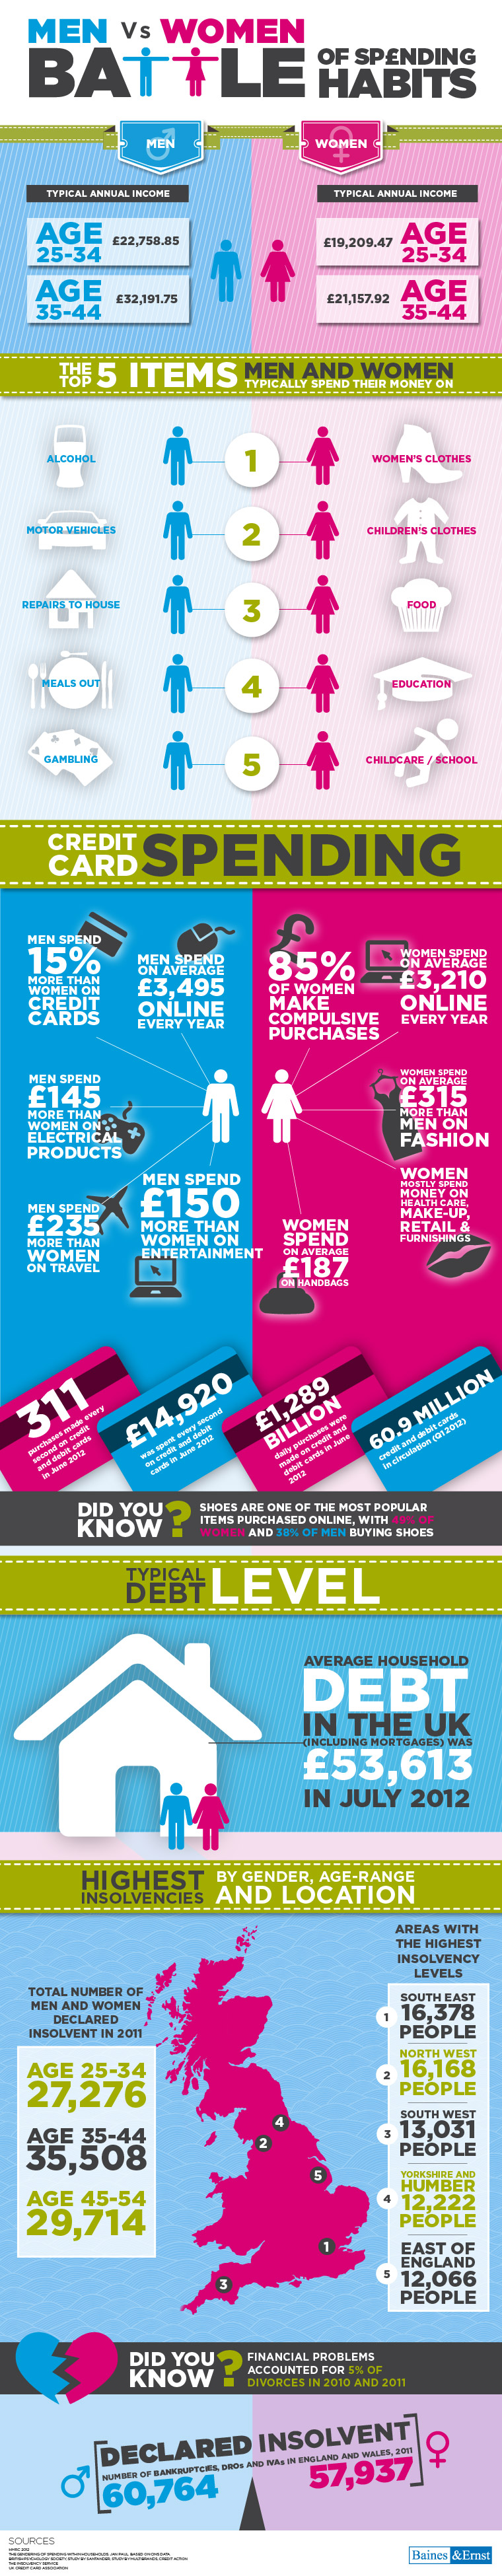 men-vs-women--spending-habits_50d05316535a2